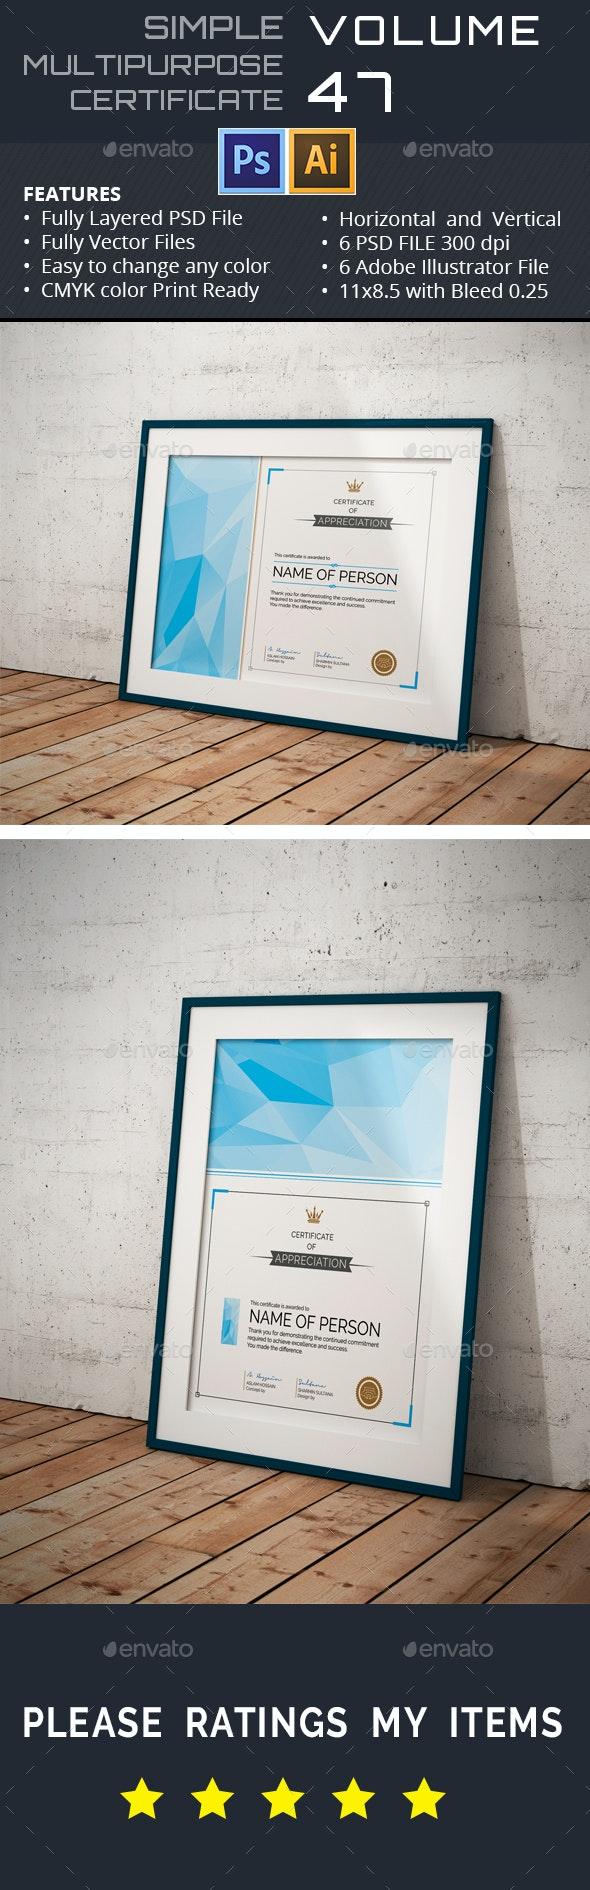 Simple Multipurpose Certificate GD047 - Certificates Stationery